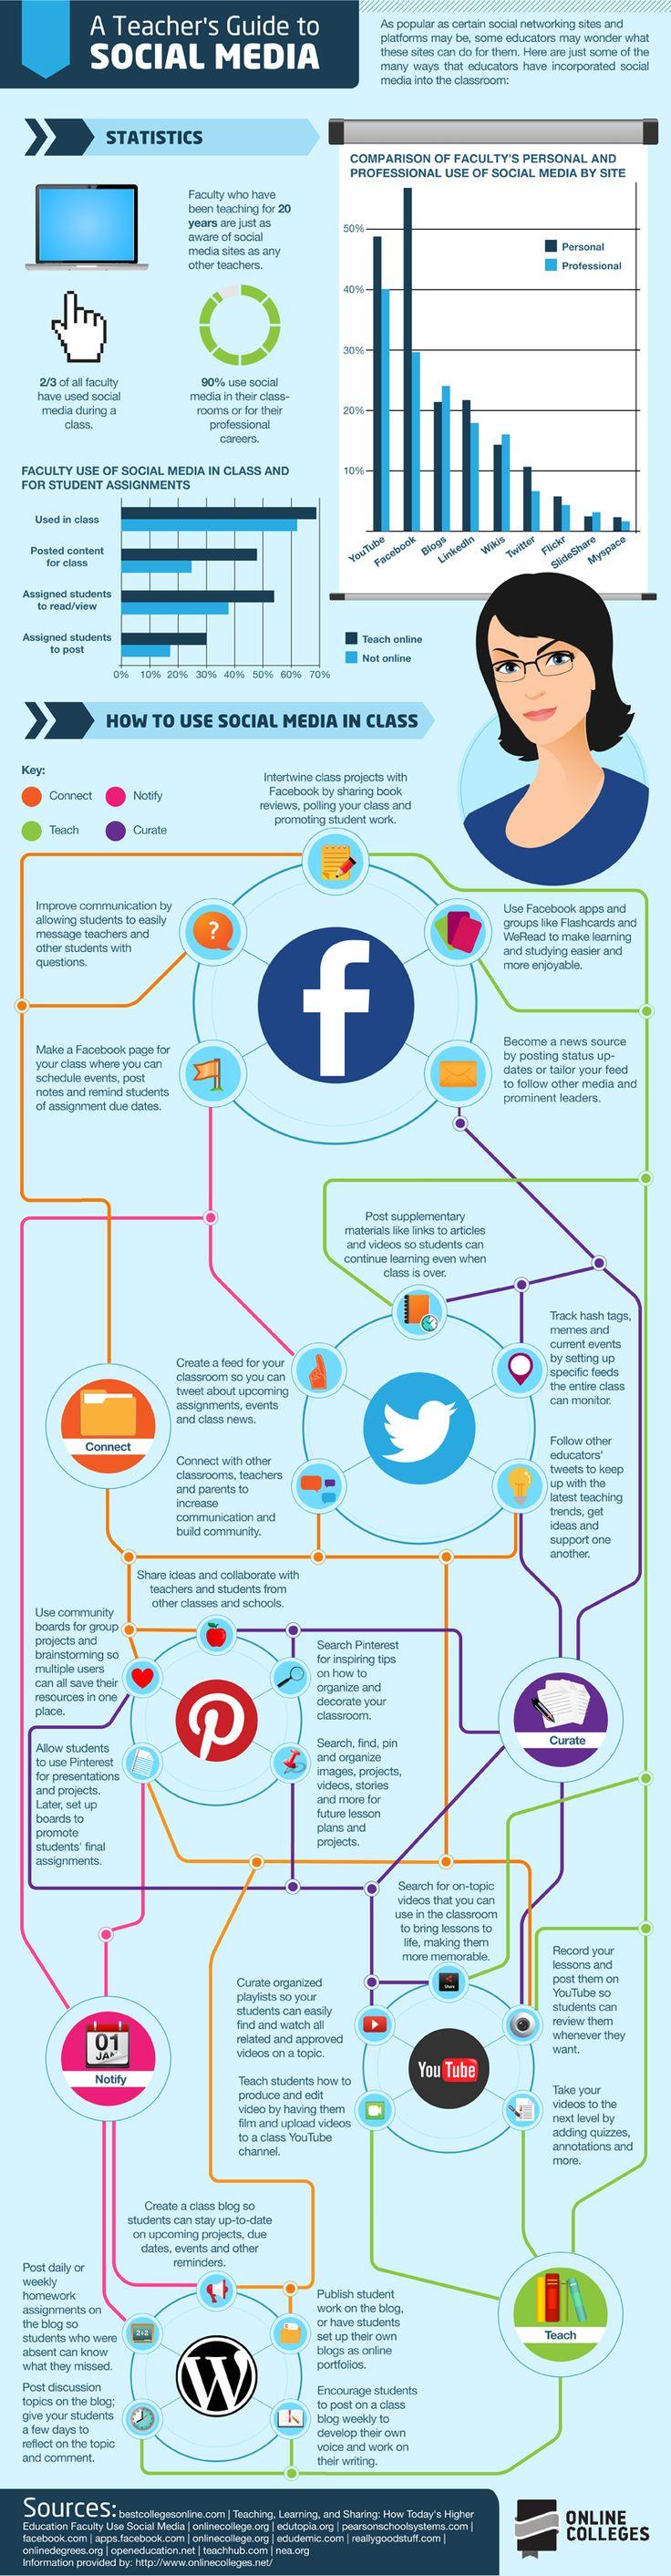 25 ways #teachers can integrate #socialmedia into education [infographic] #techintegration #edtech